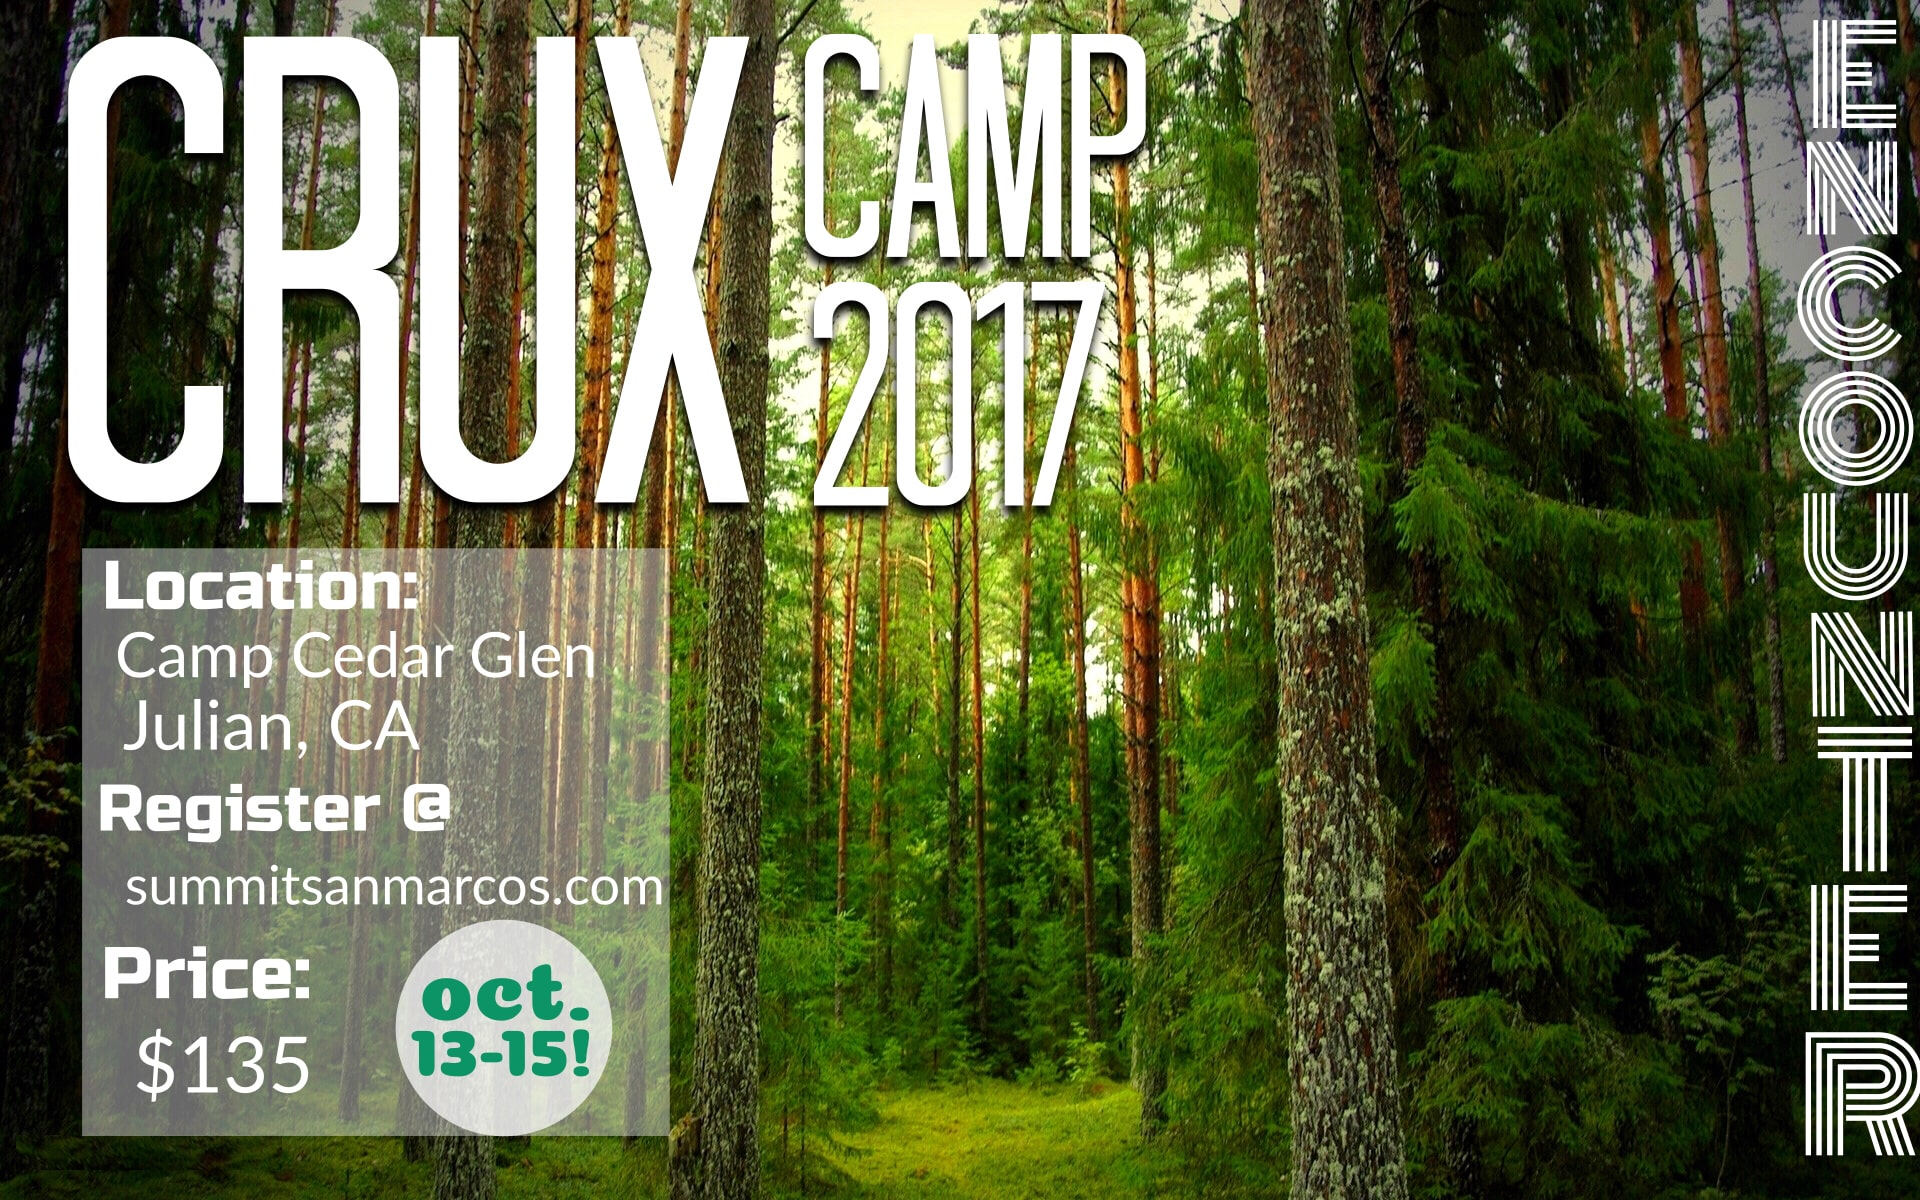 Crux revival camp